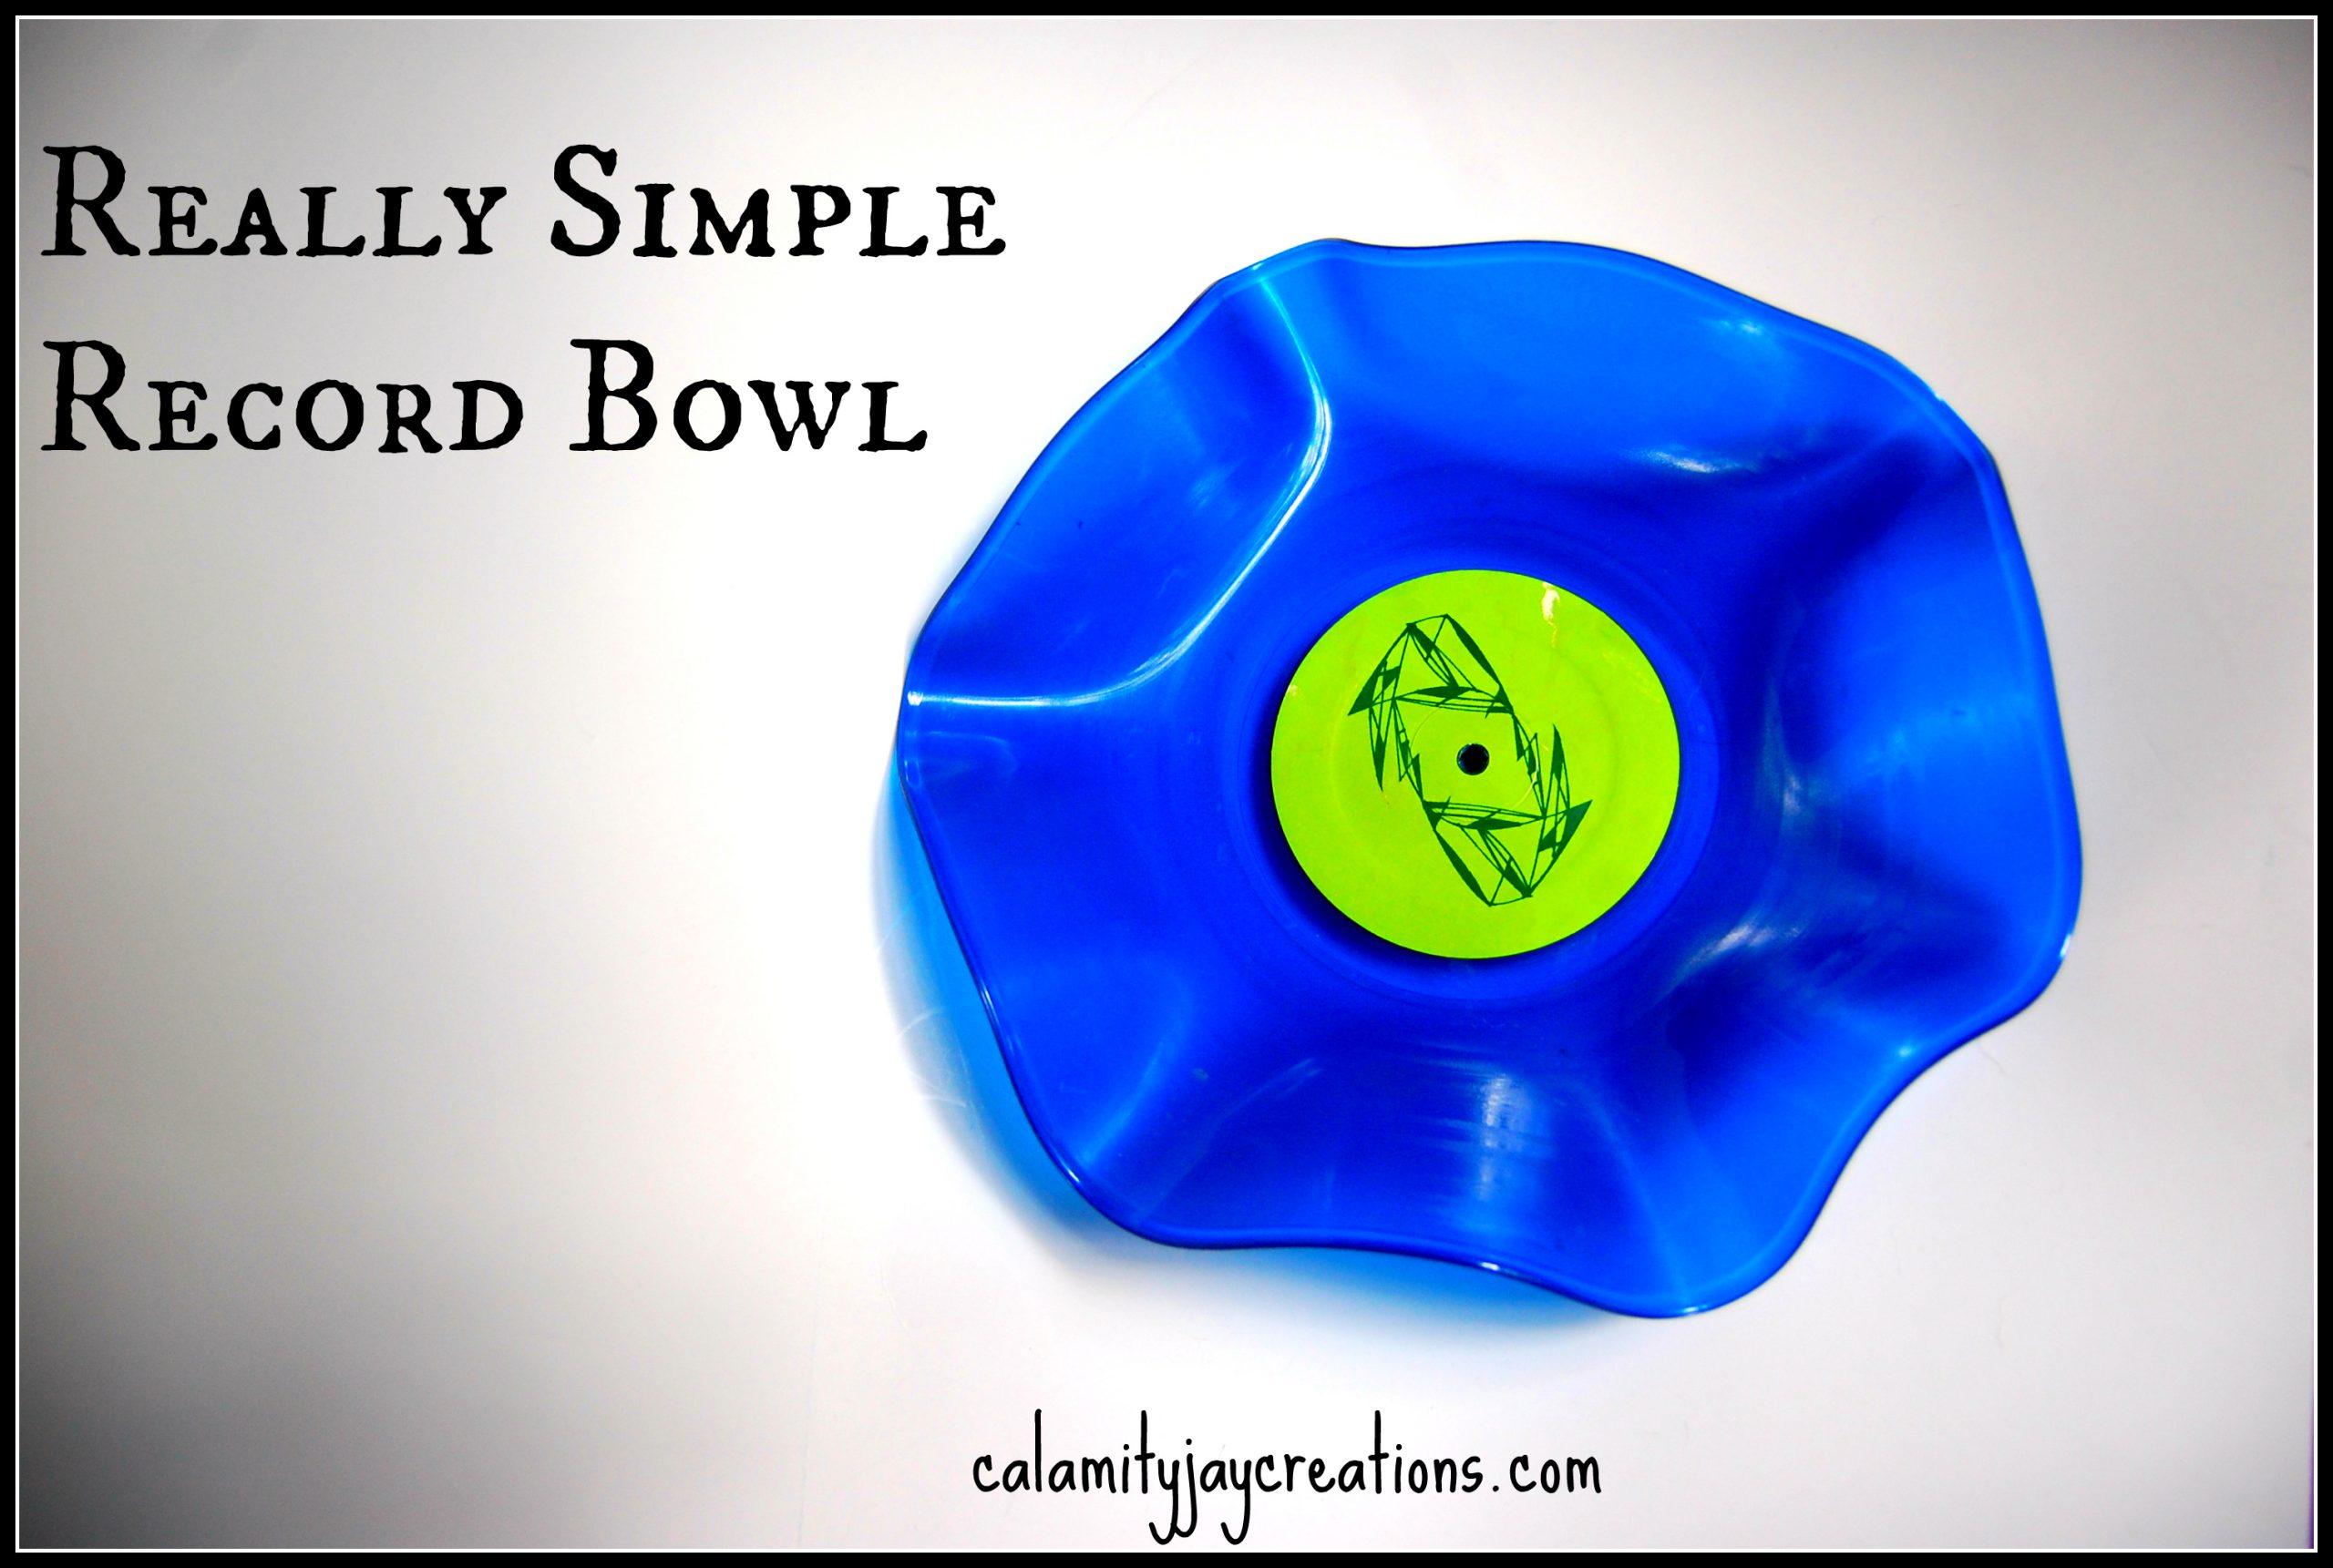 Dead Simple DIY LP vinyl bowl